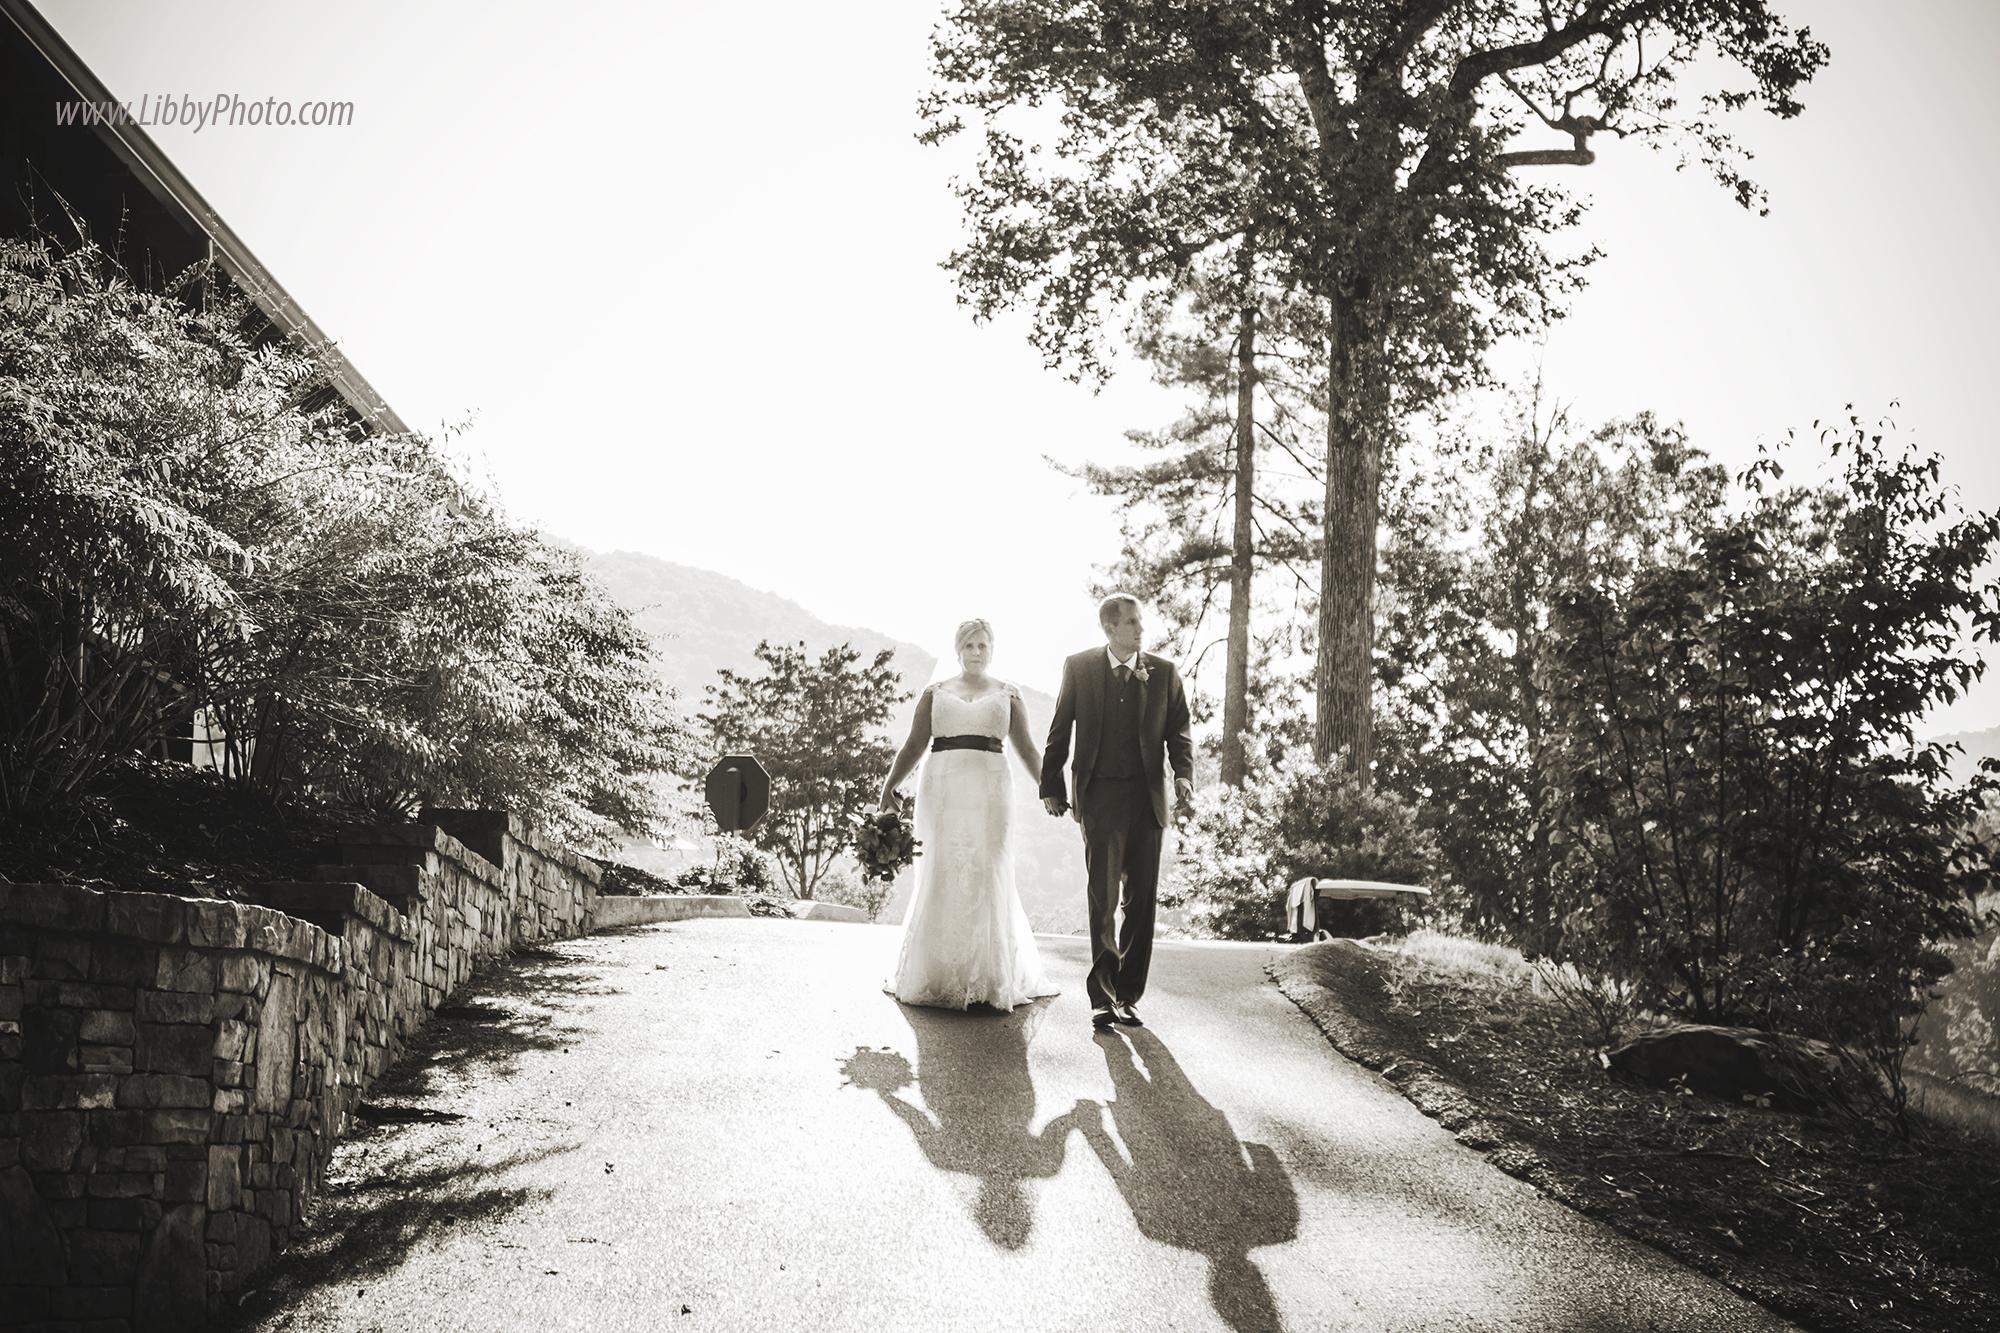 Atlanta wedding photography, Libbyphoto11 (18).jpg